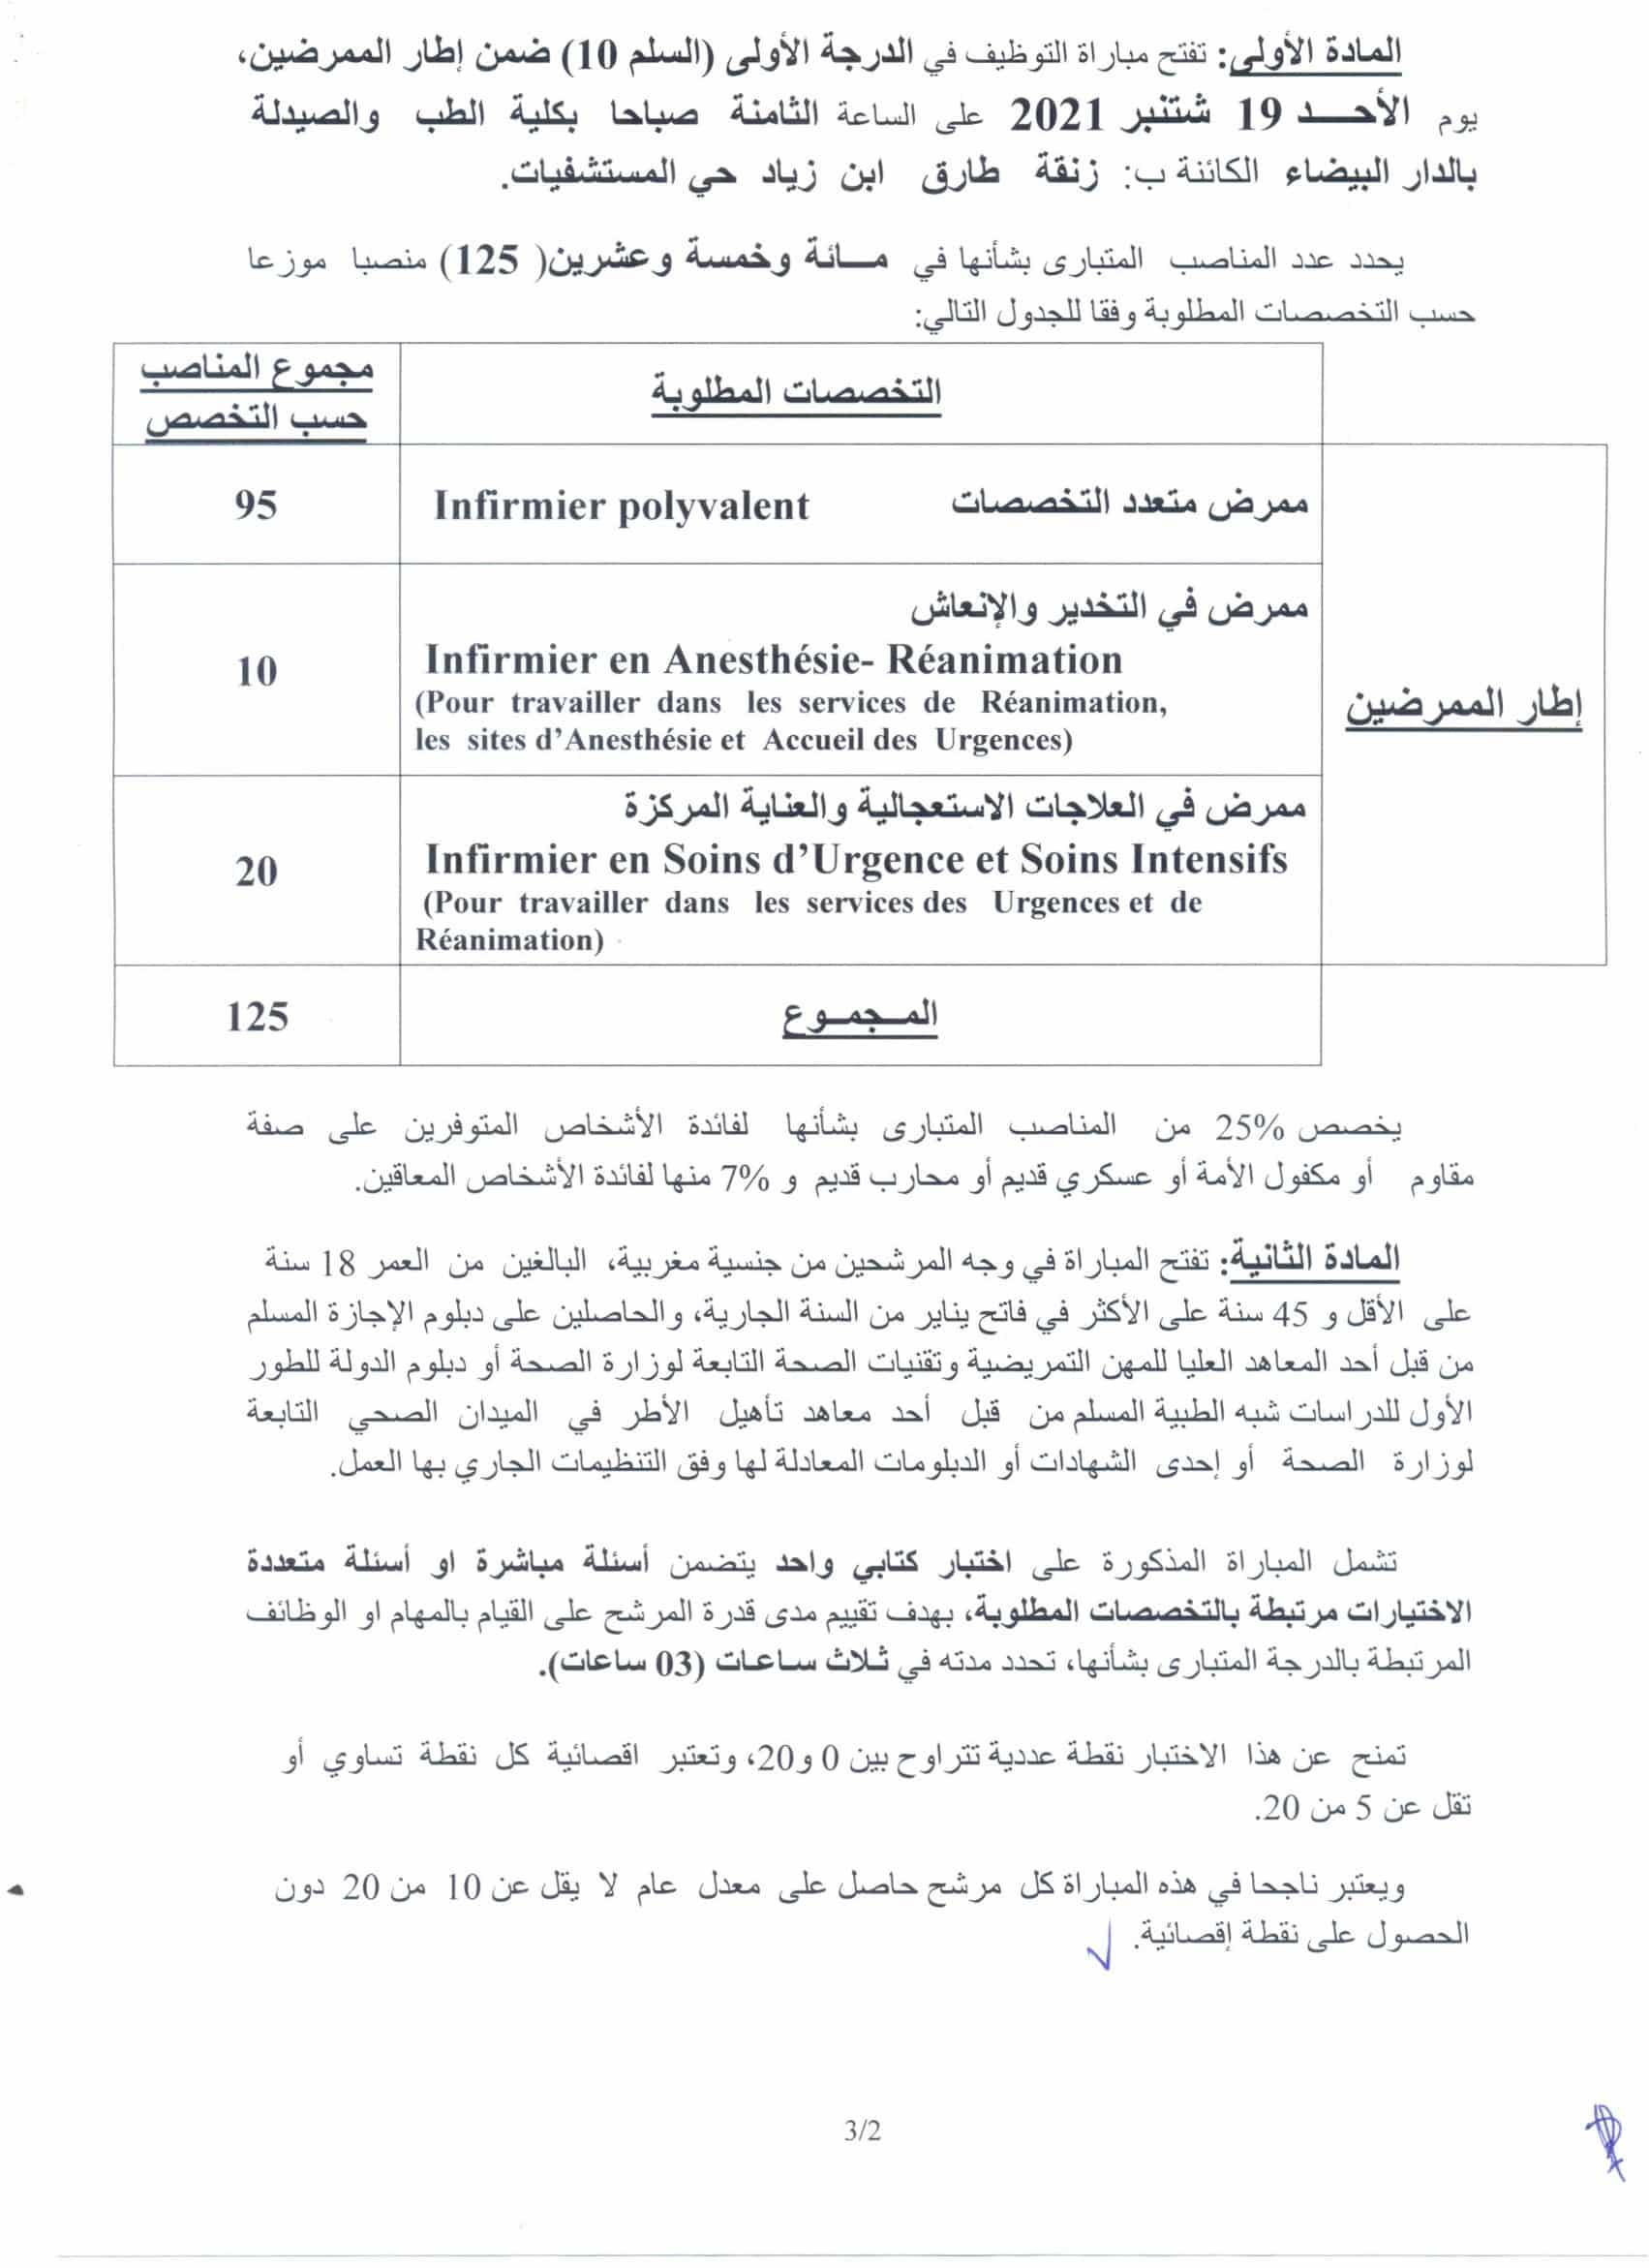 RECRUTINF1992021 2 Concours de Recrutement CHU Ibn Rochd 2021 (156 Postes)